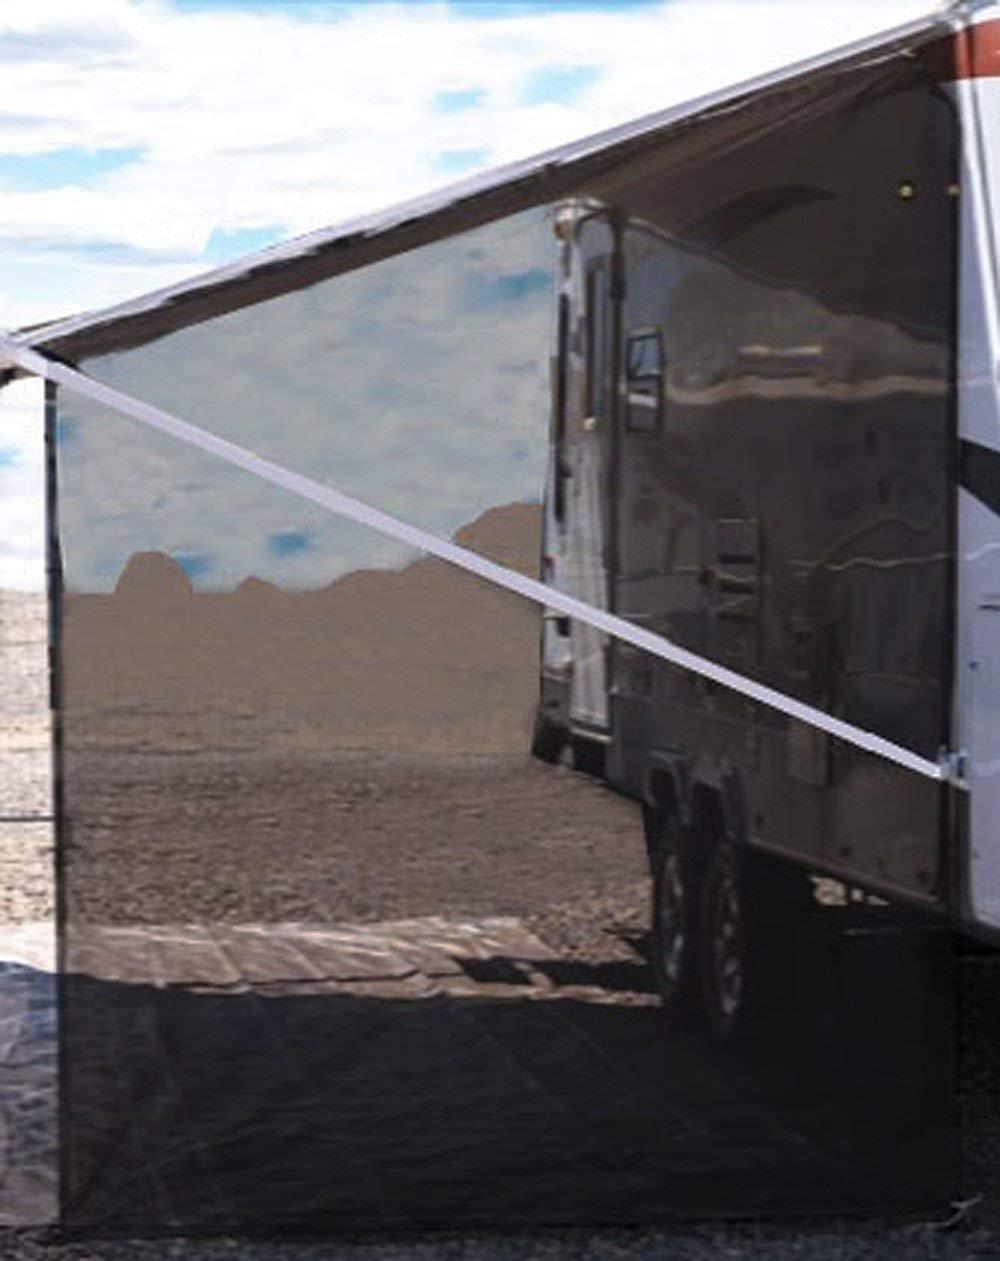 Tentproinc RV Awning Side Sun Shade Net 9u0027×7u0027 Black Complete Kits Drop  sc 1 st  Amazon.com & Canopy for RV: Amazon.com